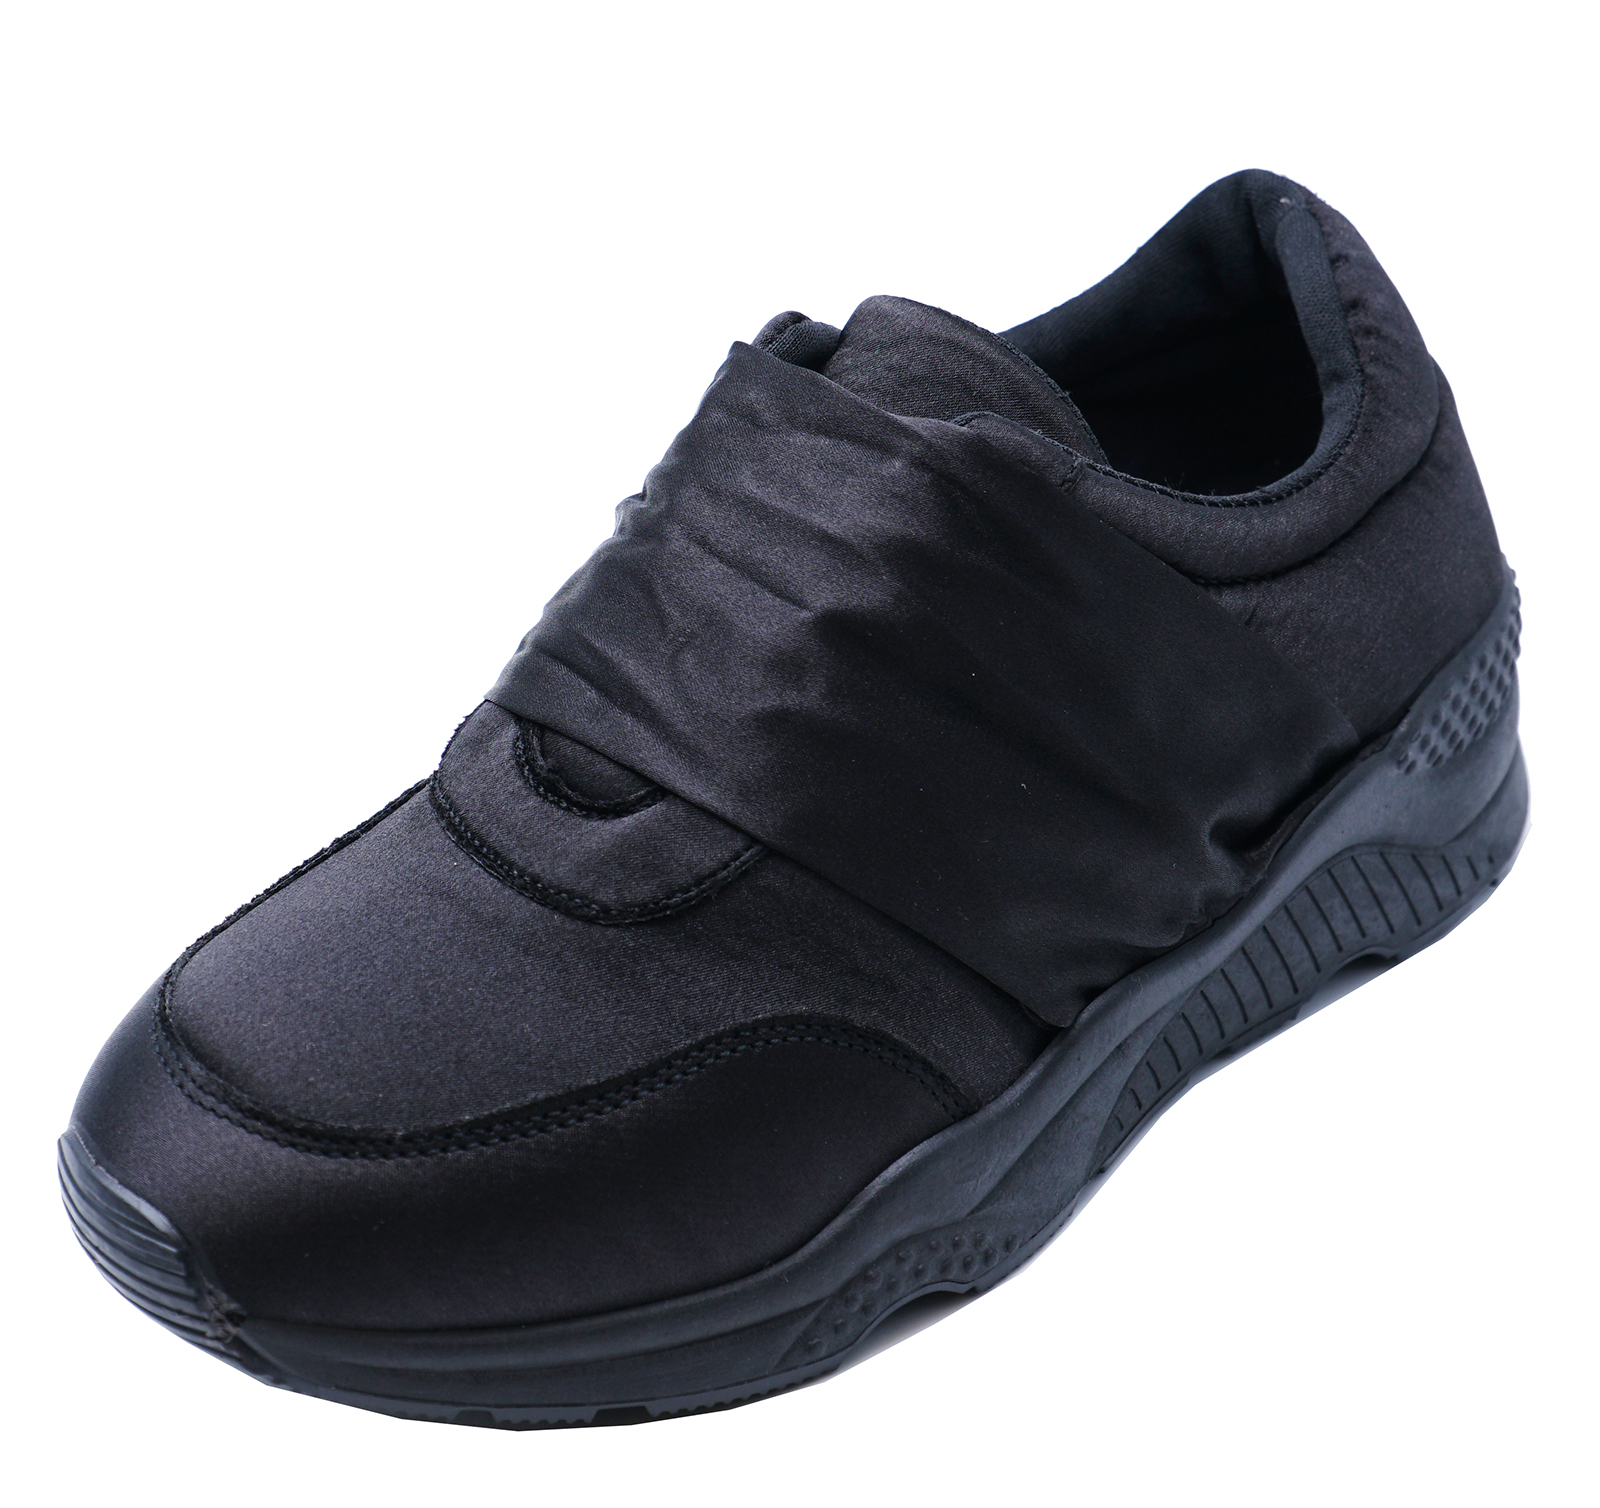 LADIES-BLACK-SATIN-SLIP-ON-TRAINERS-NURSE-PUMPS-PLIMSOLLS-FLAT-SHOES-SIZE-3-8